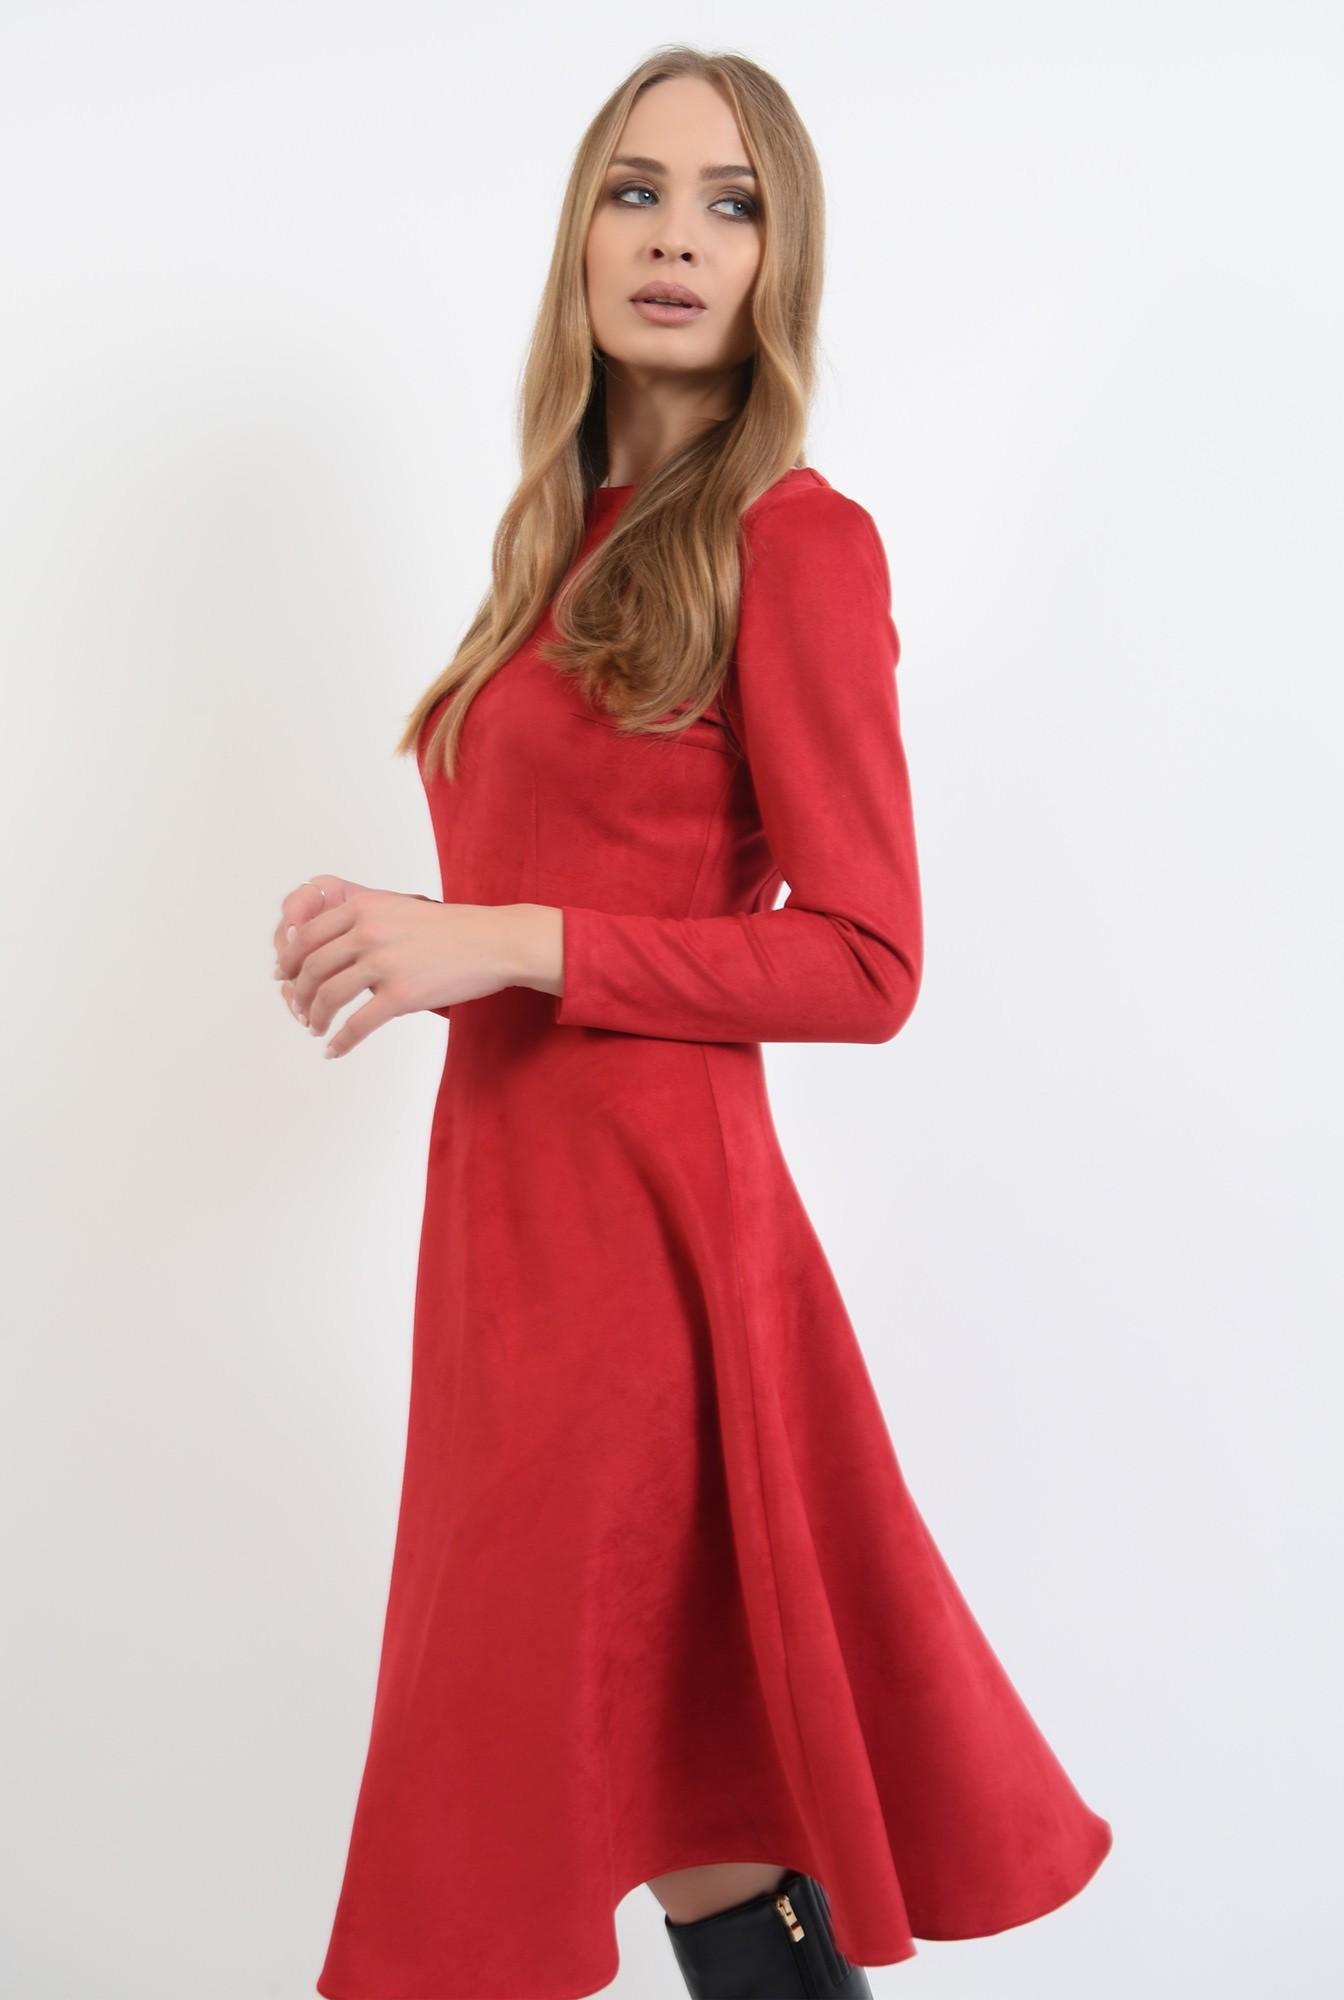 0 - rochie rosie, cu nasturi metalici la spate, evazata